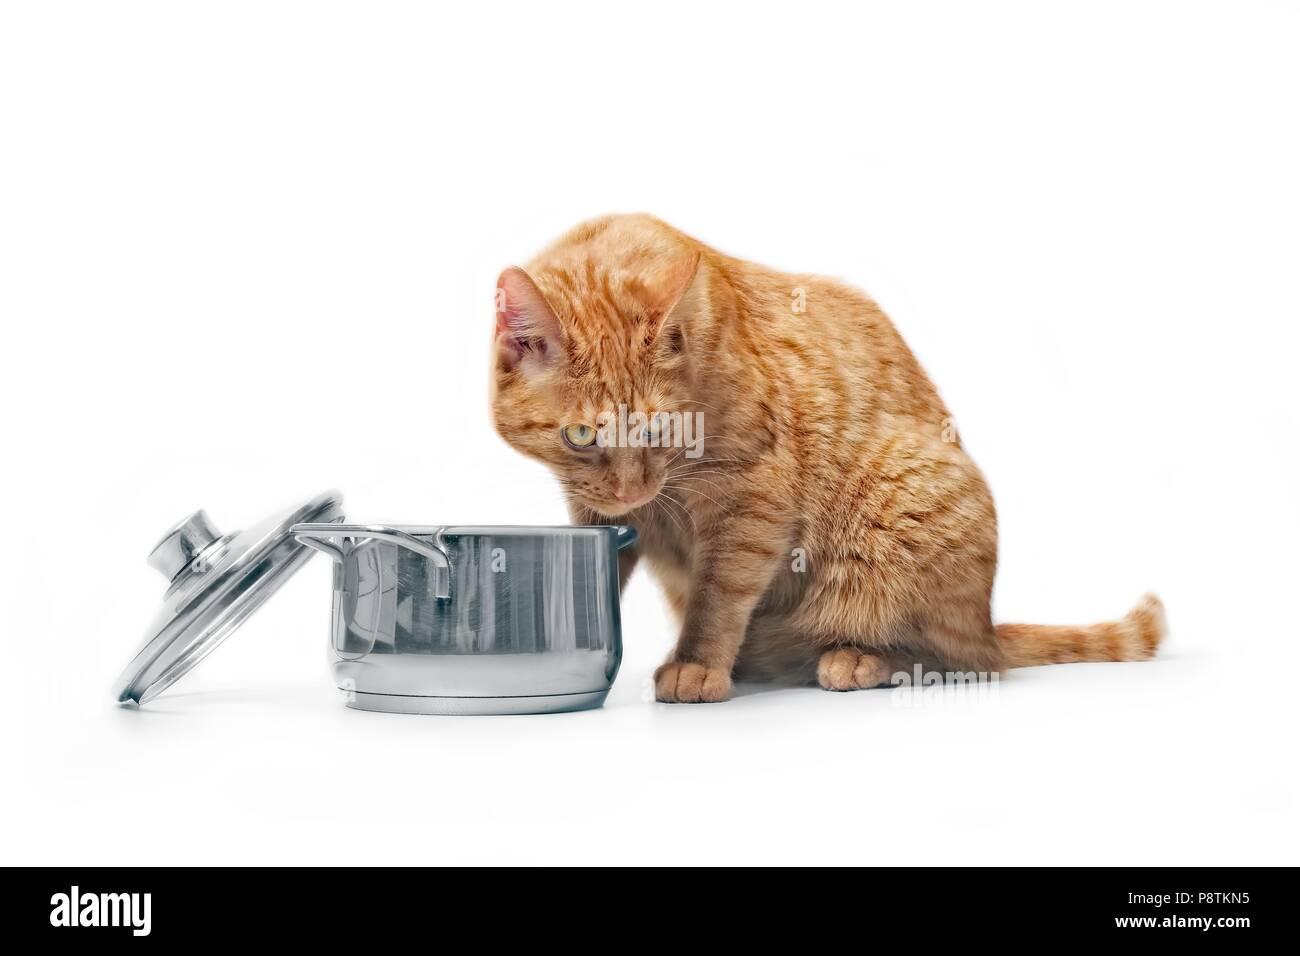 Fame ginger cat guardando curioso in una pentola di cottura. Immagini Stock